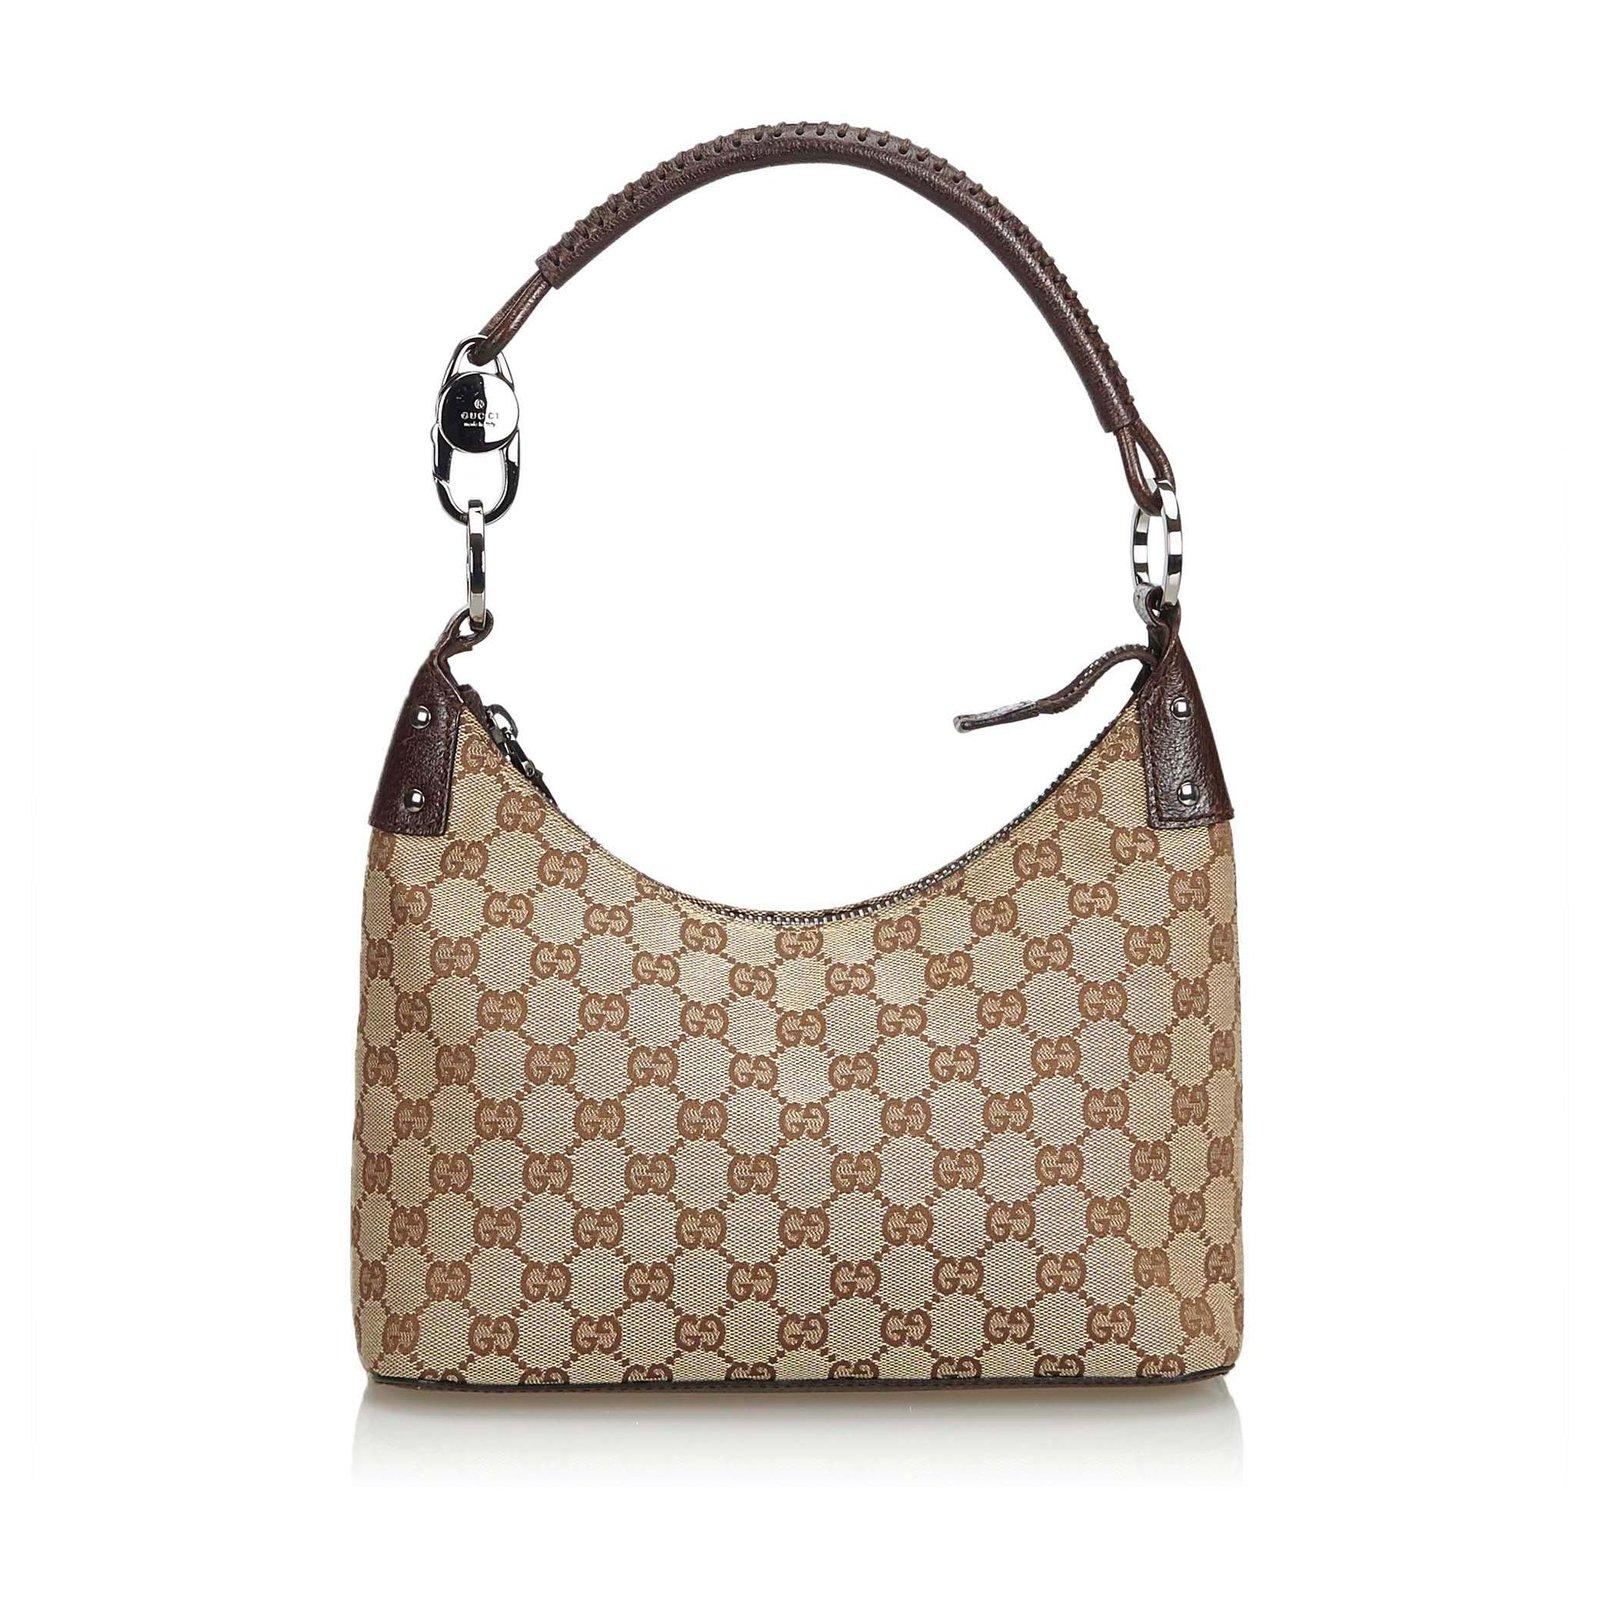 9fafd9de417 Gucci Gucci Brown GG Jacquard Hobo Bag Handbags Leather